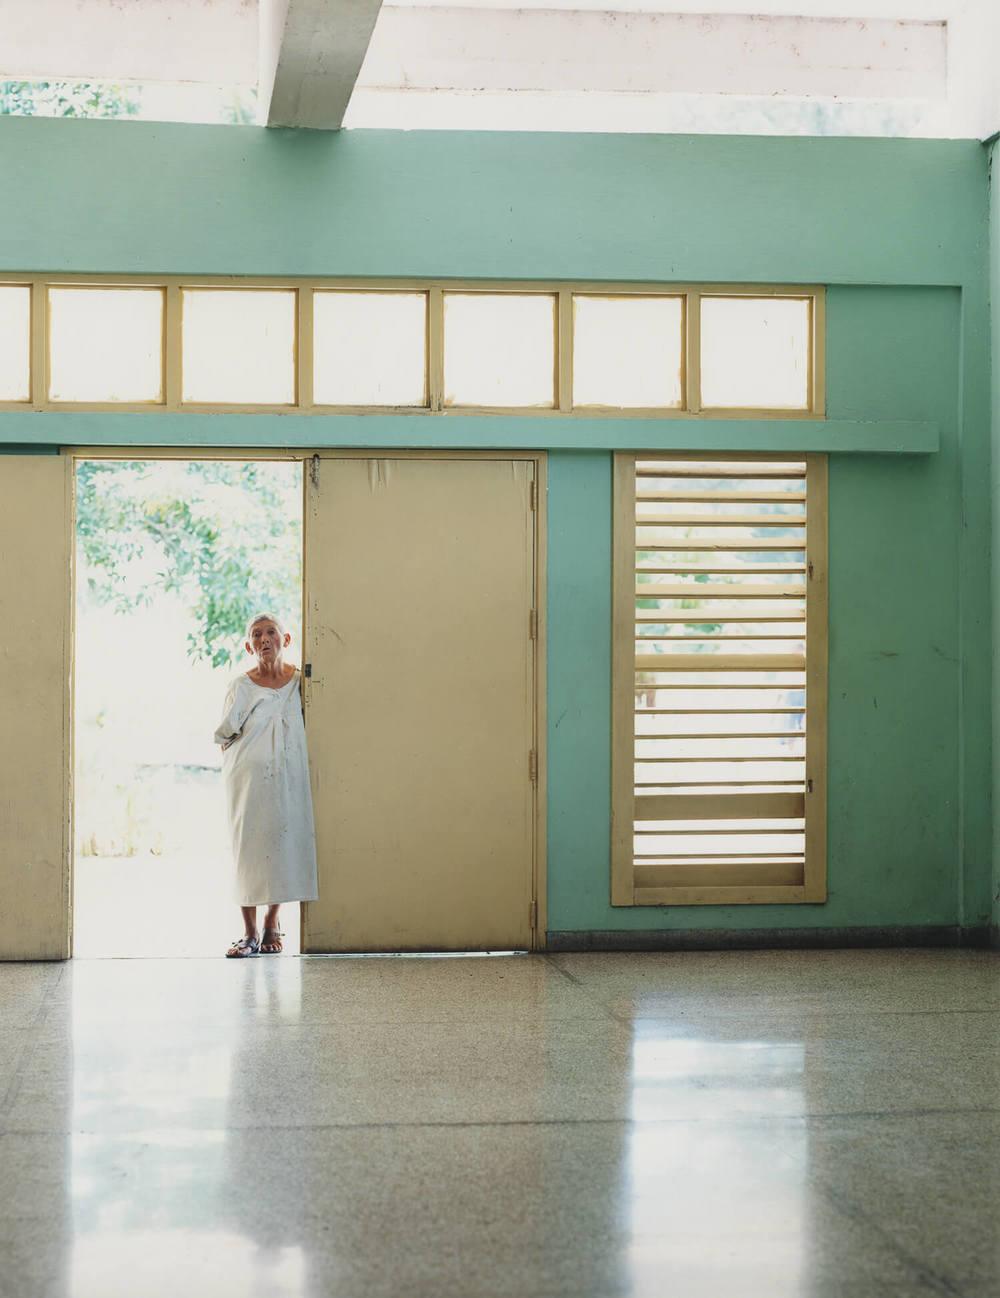 Rene Vallejo Psychiatric Hospital, Cuba, C-type print, 16 x 20 inches, 2003